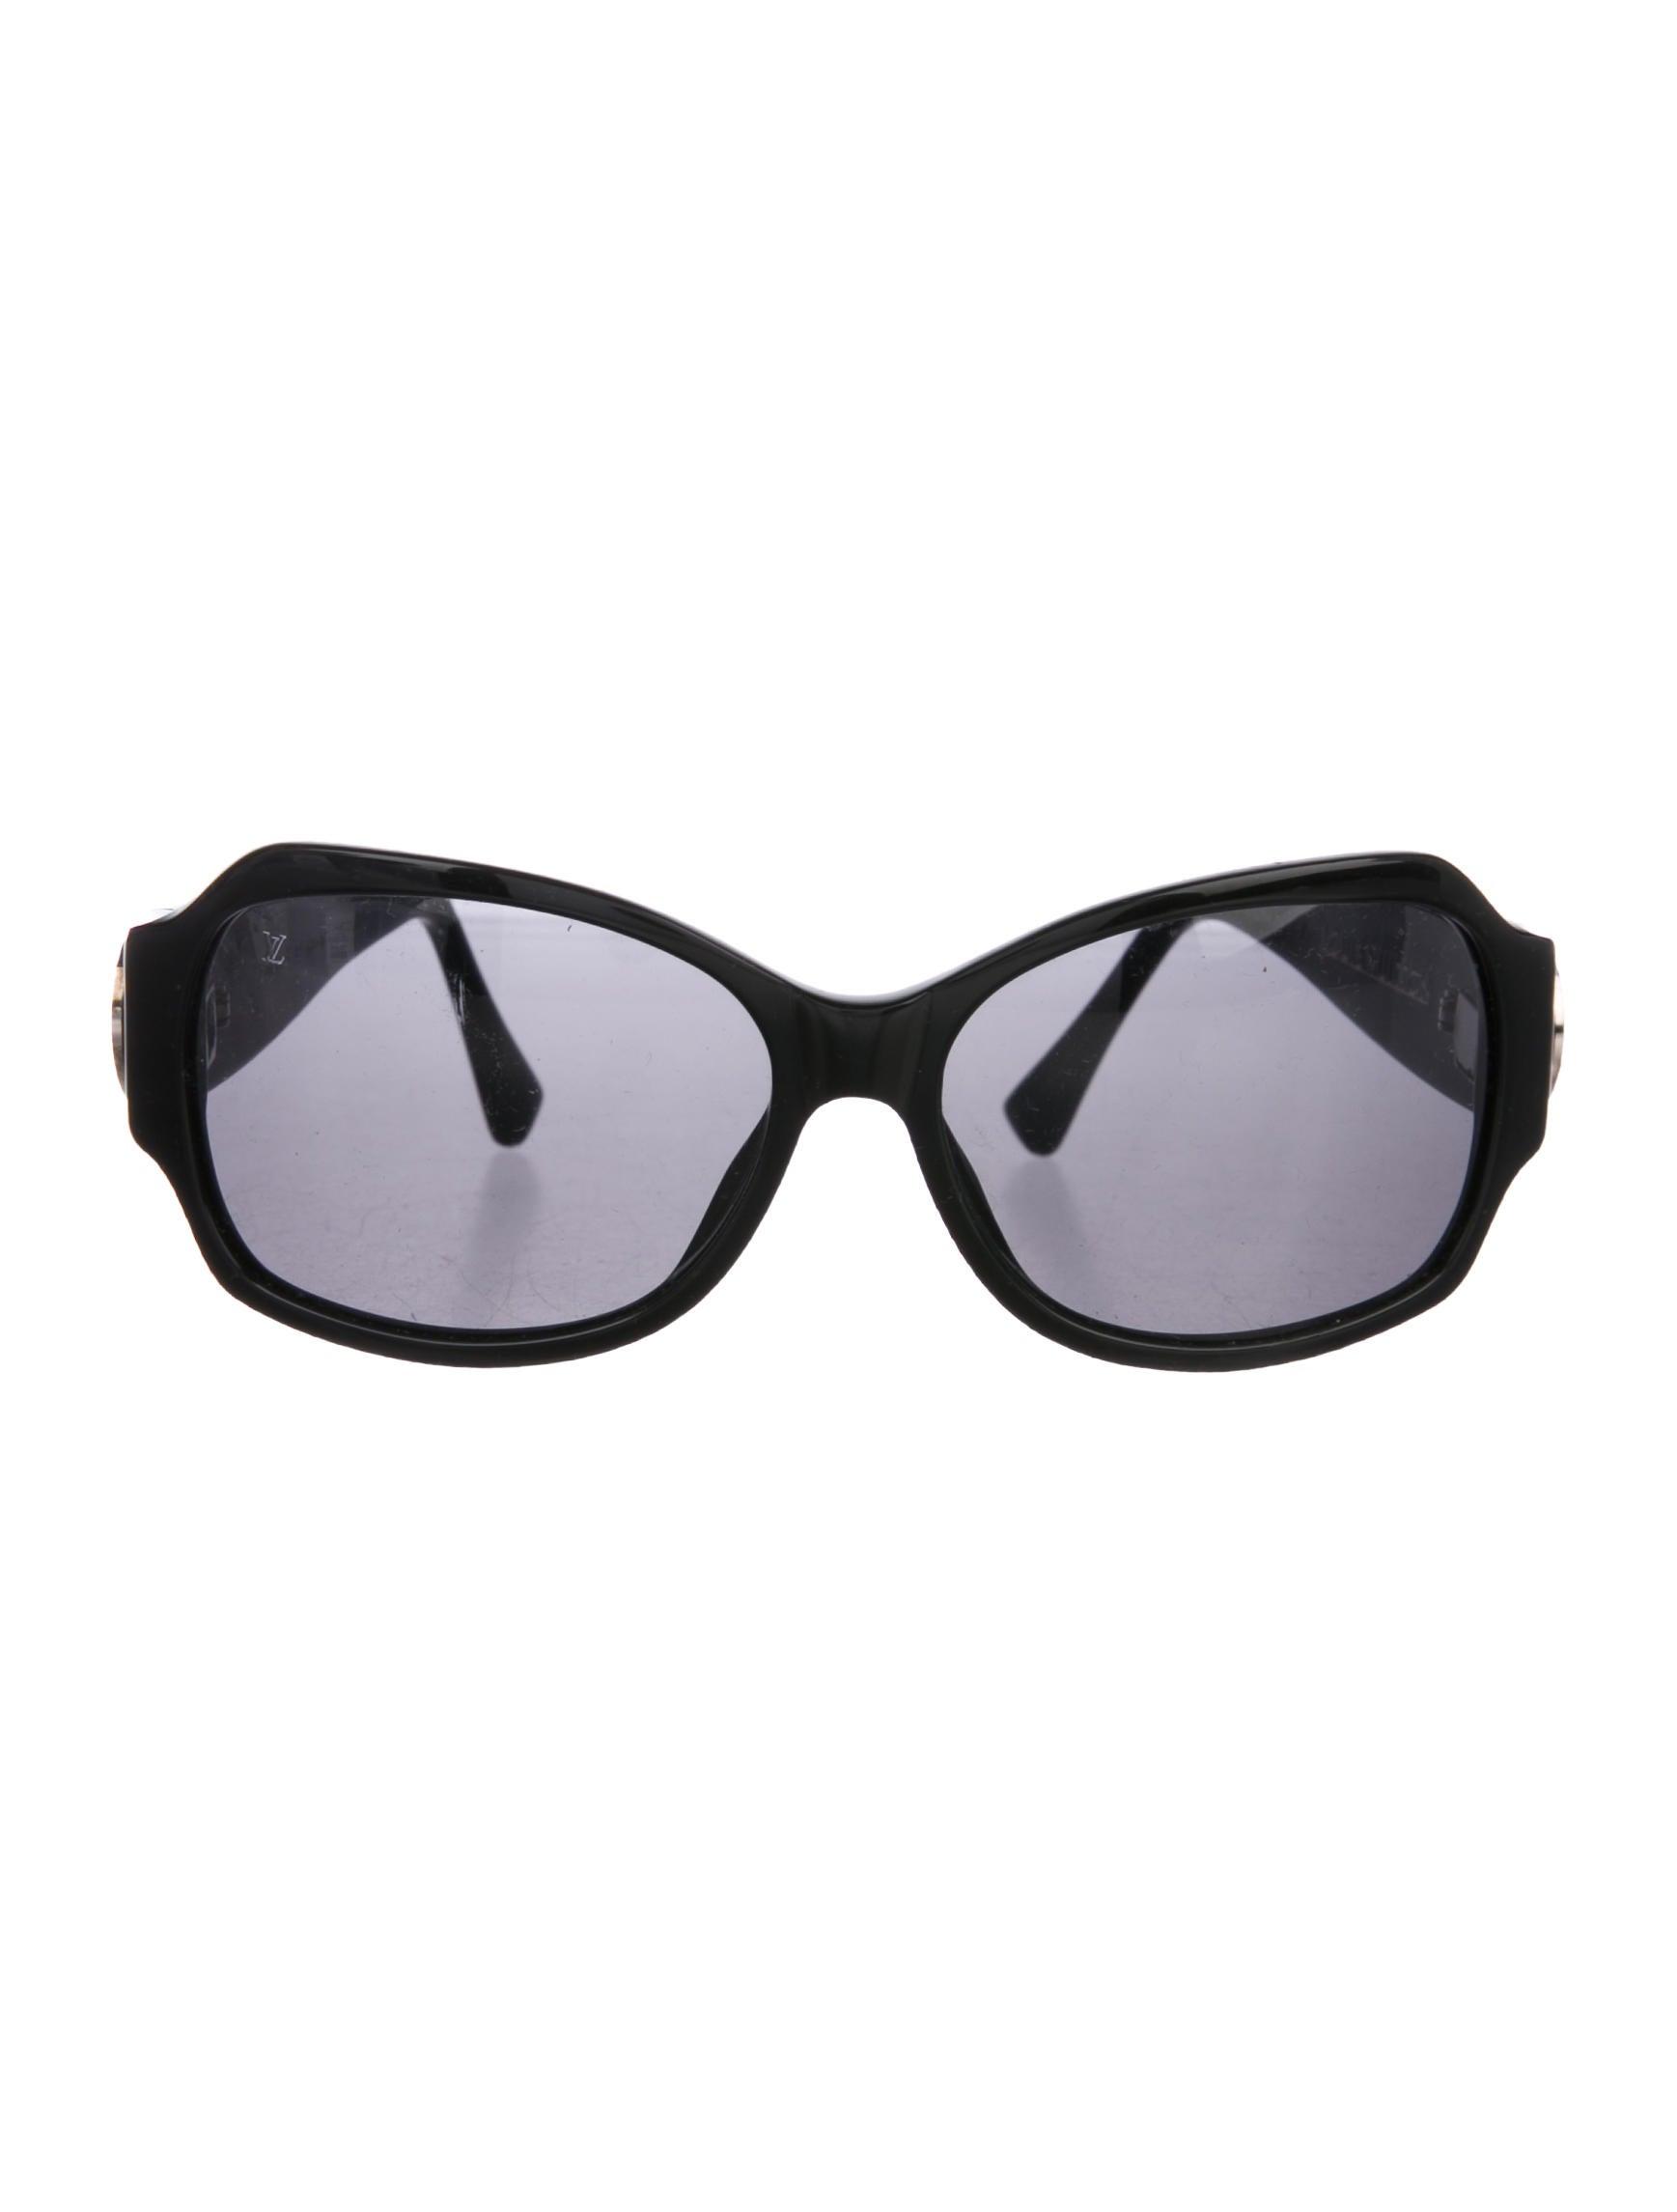 a8b5485cb96 Louis Vuitton Ursula Strass Sunglasses - Accessories - LOU198228 ...